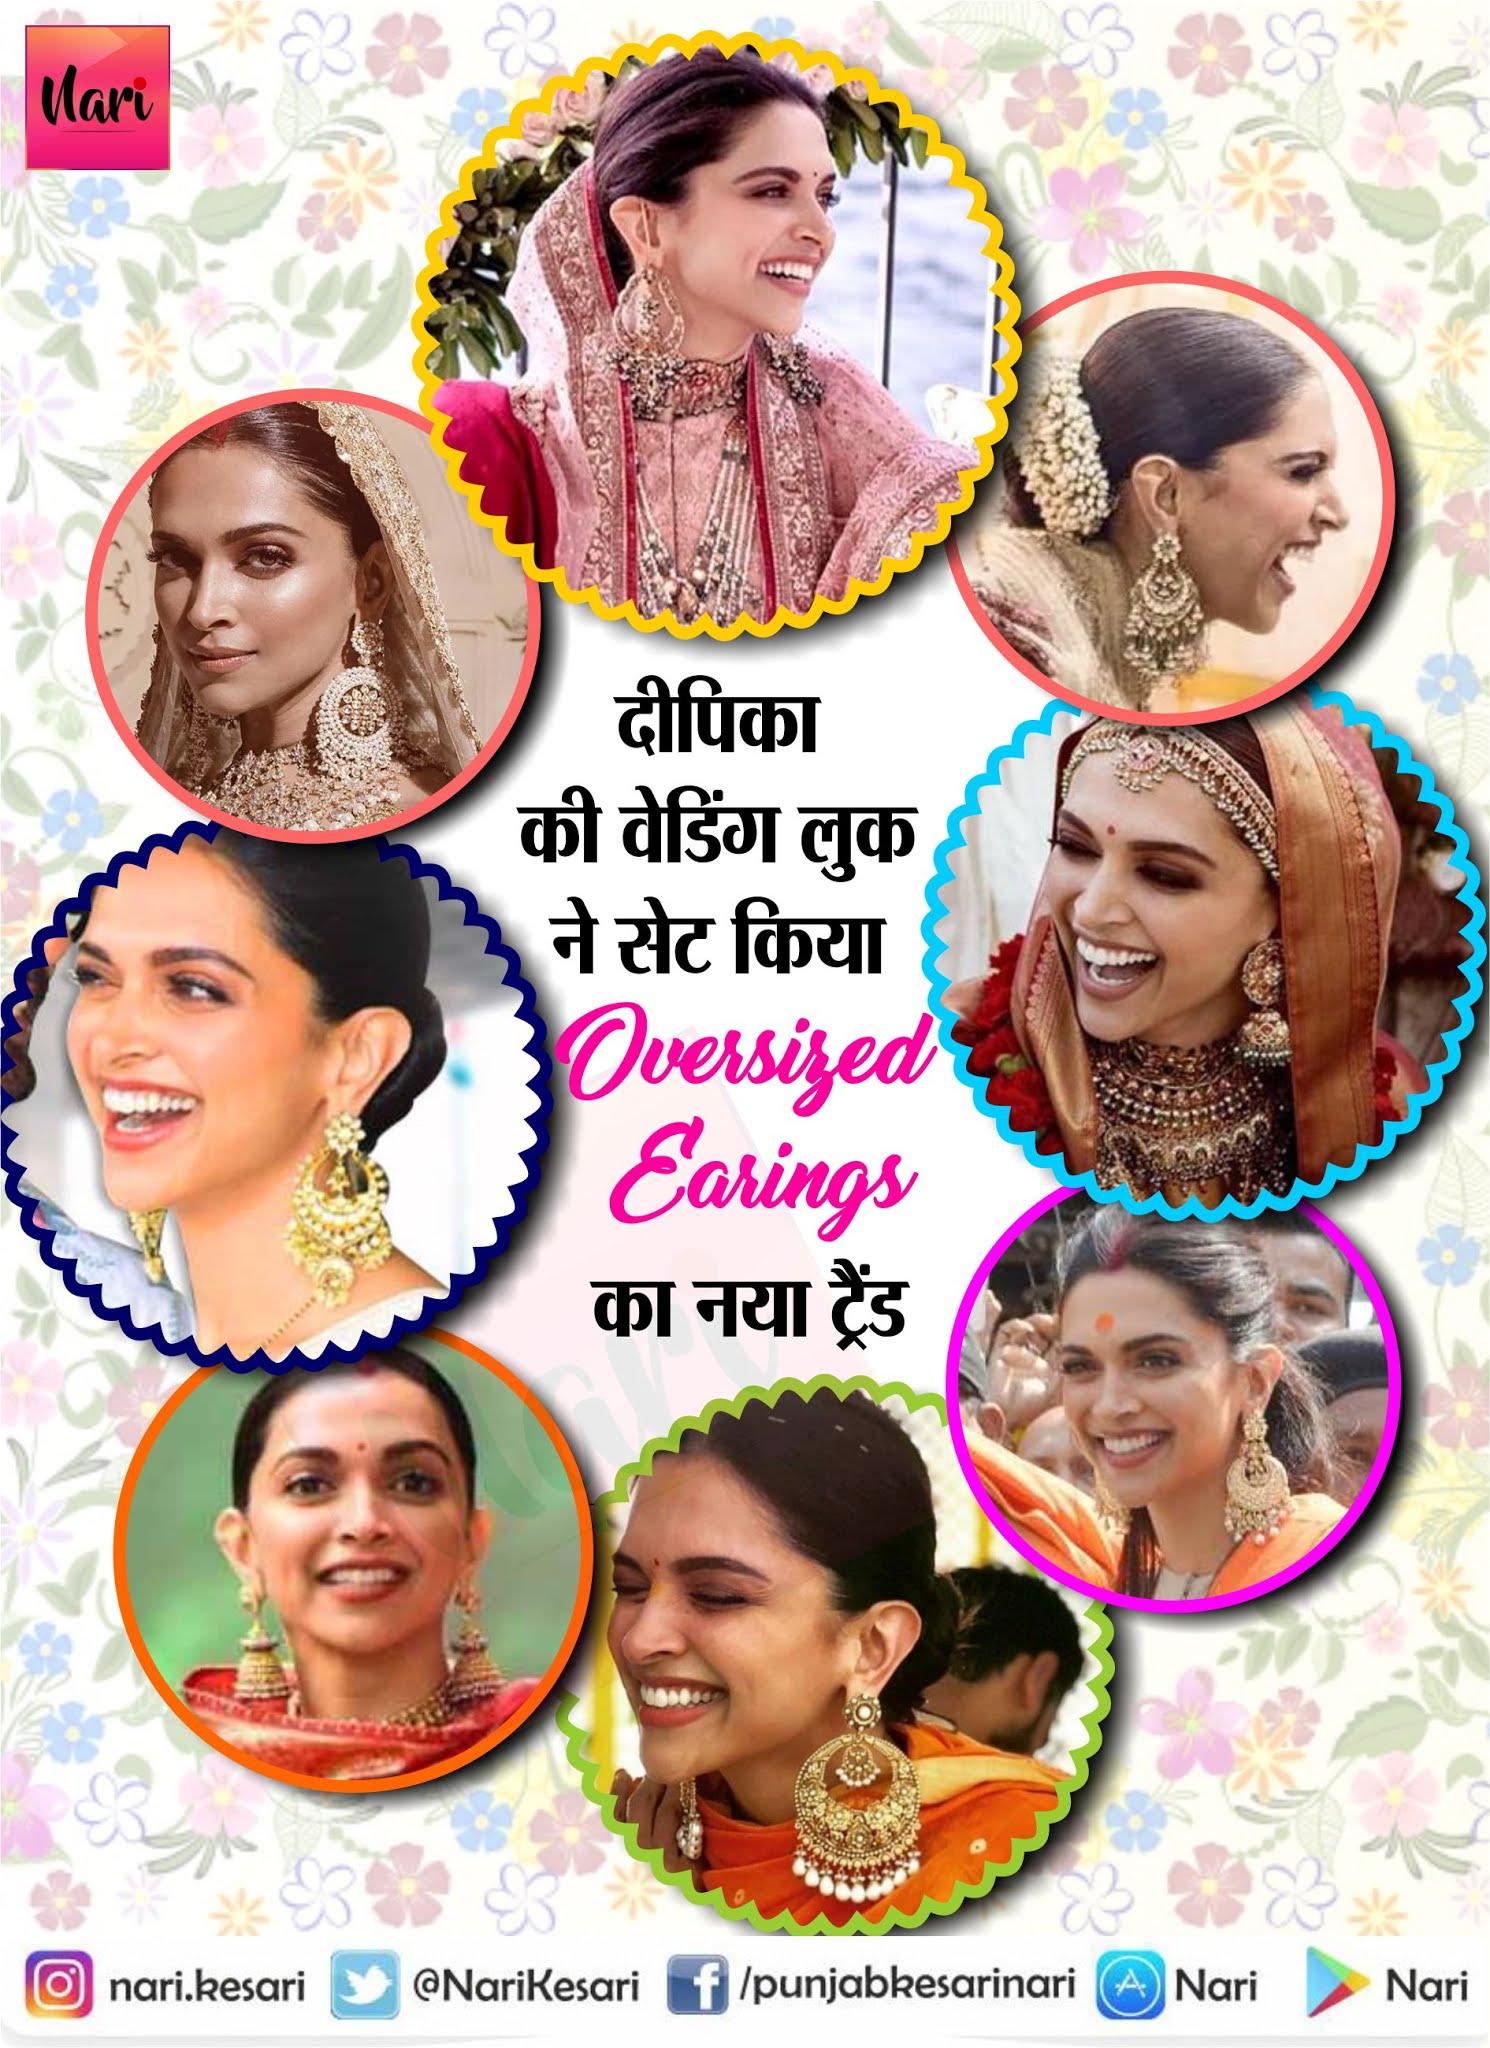 PunjabKesari, Deepveer Wedding, Nari, Deepika Padukone oversized earrings Image